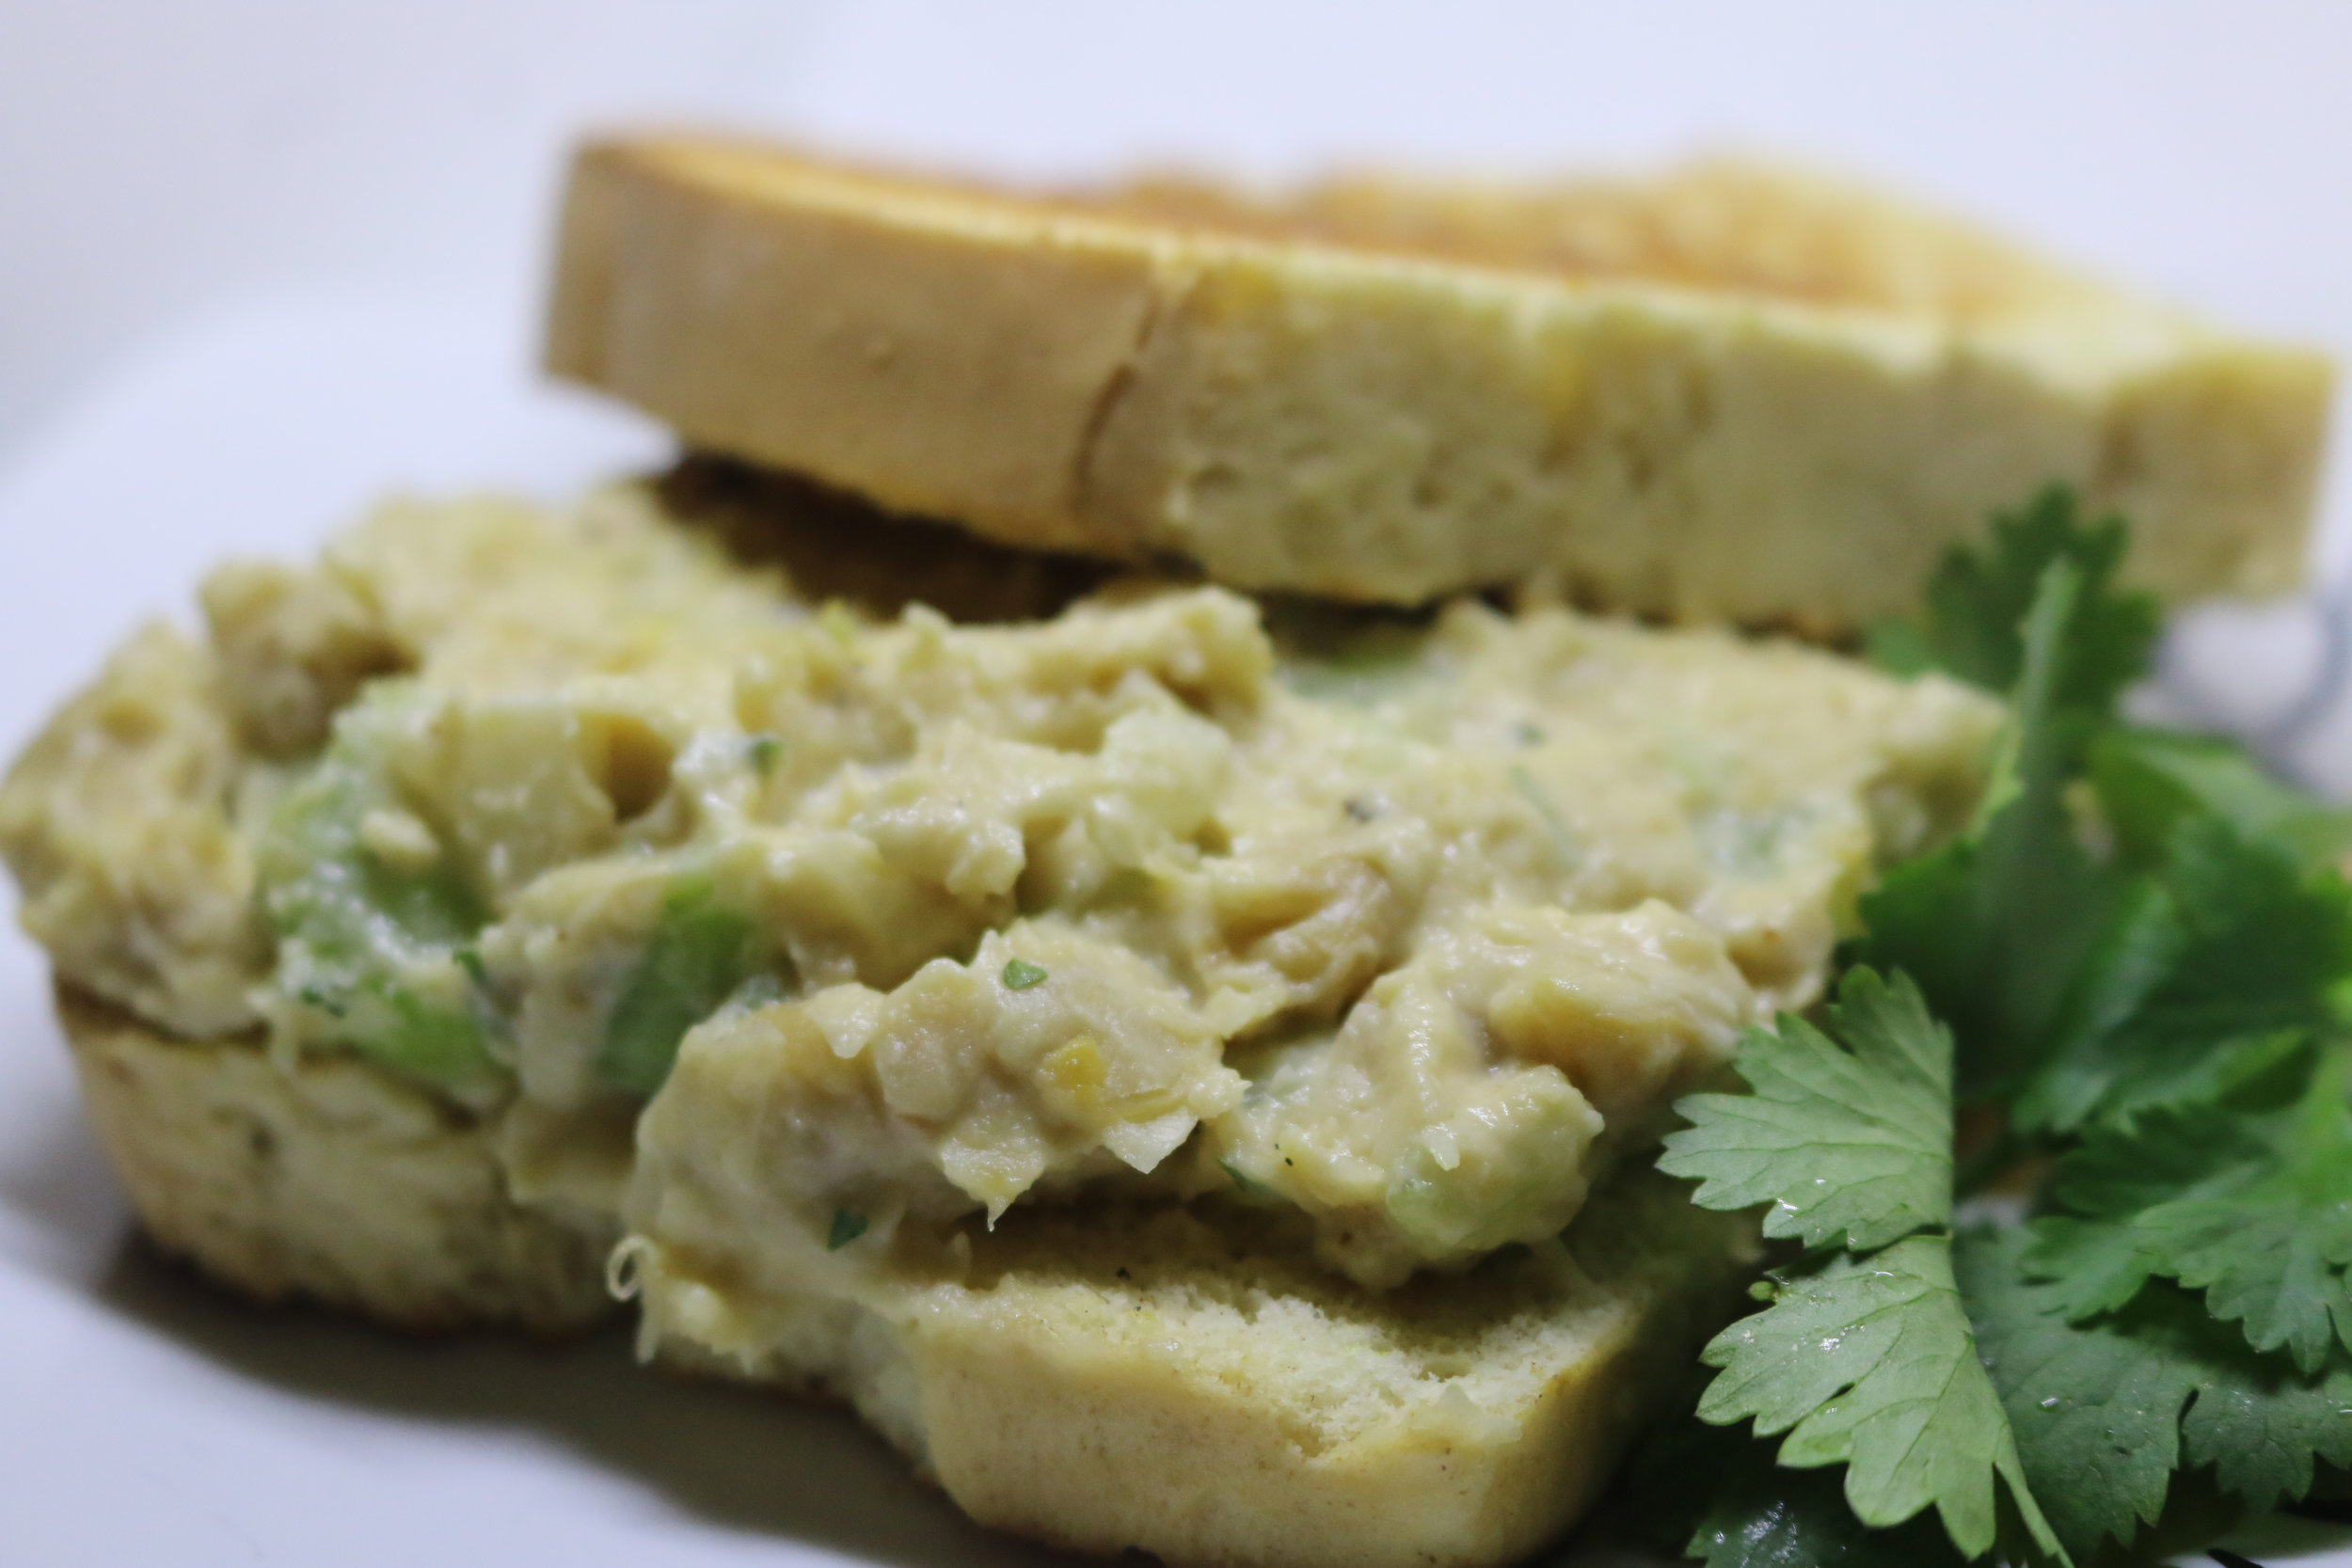 "Chickpea Tuna Salad Sandwich - $9 - Our homemade ""tuna"" salad made of chickpeas and sandwiches in our homemade spelt breadIngredients: Chickpeas, Celery, Onions, Mayo, Mustard Powder, Sea Salt, Cumin, Kelp, DIll, Parsley, Paprika"